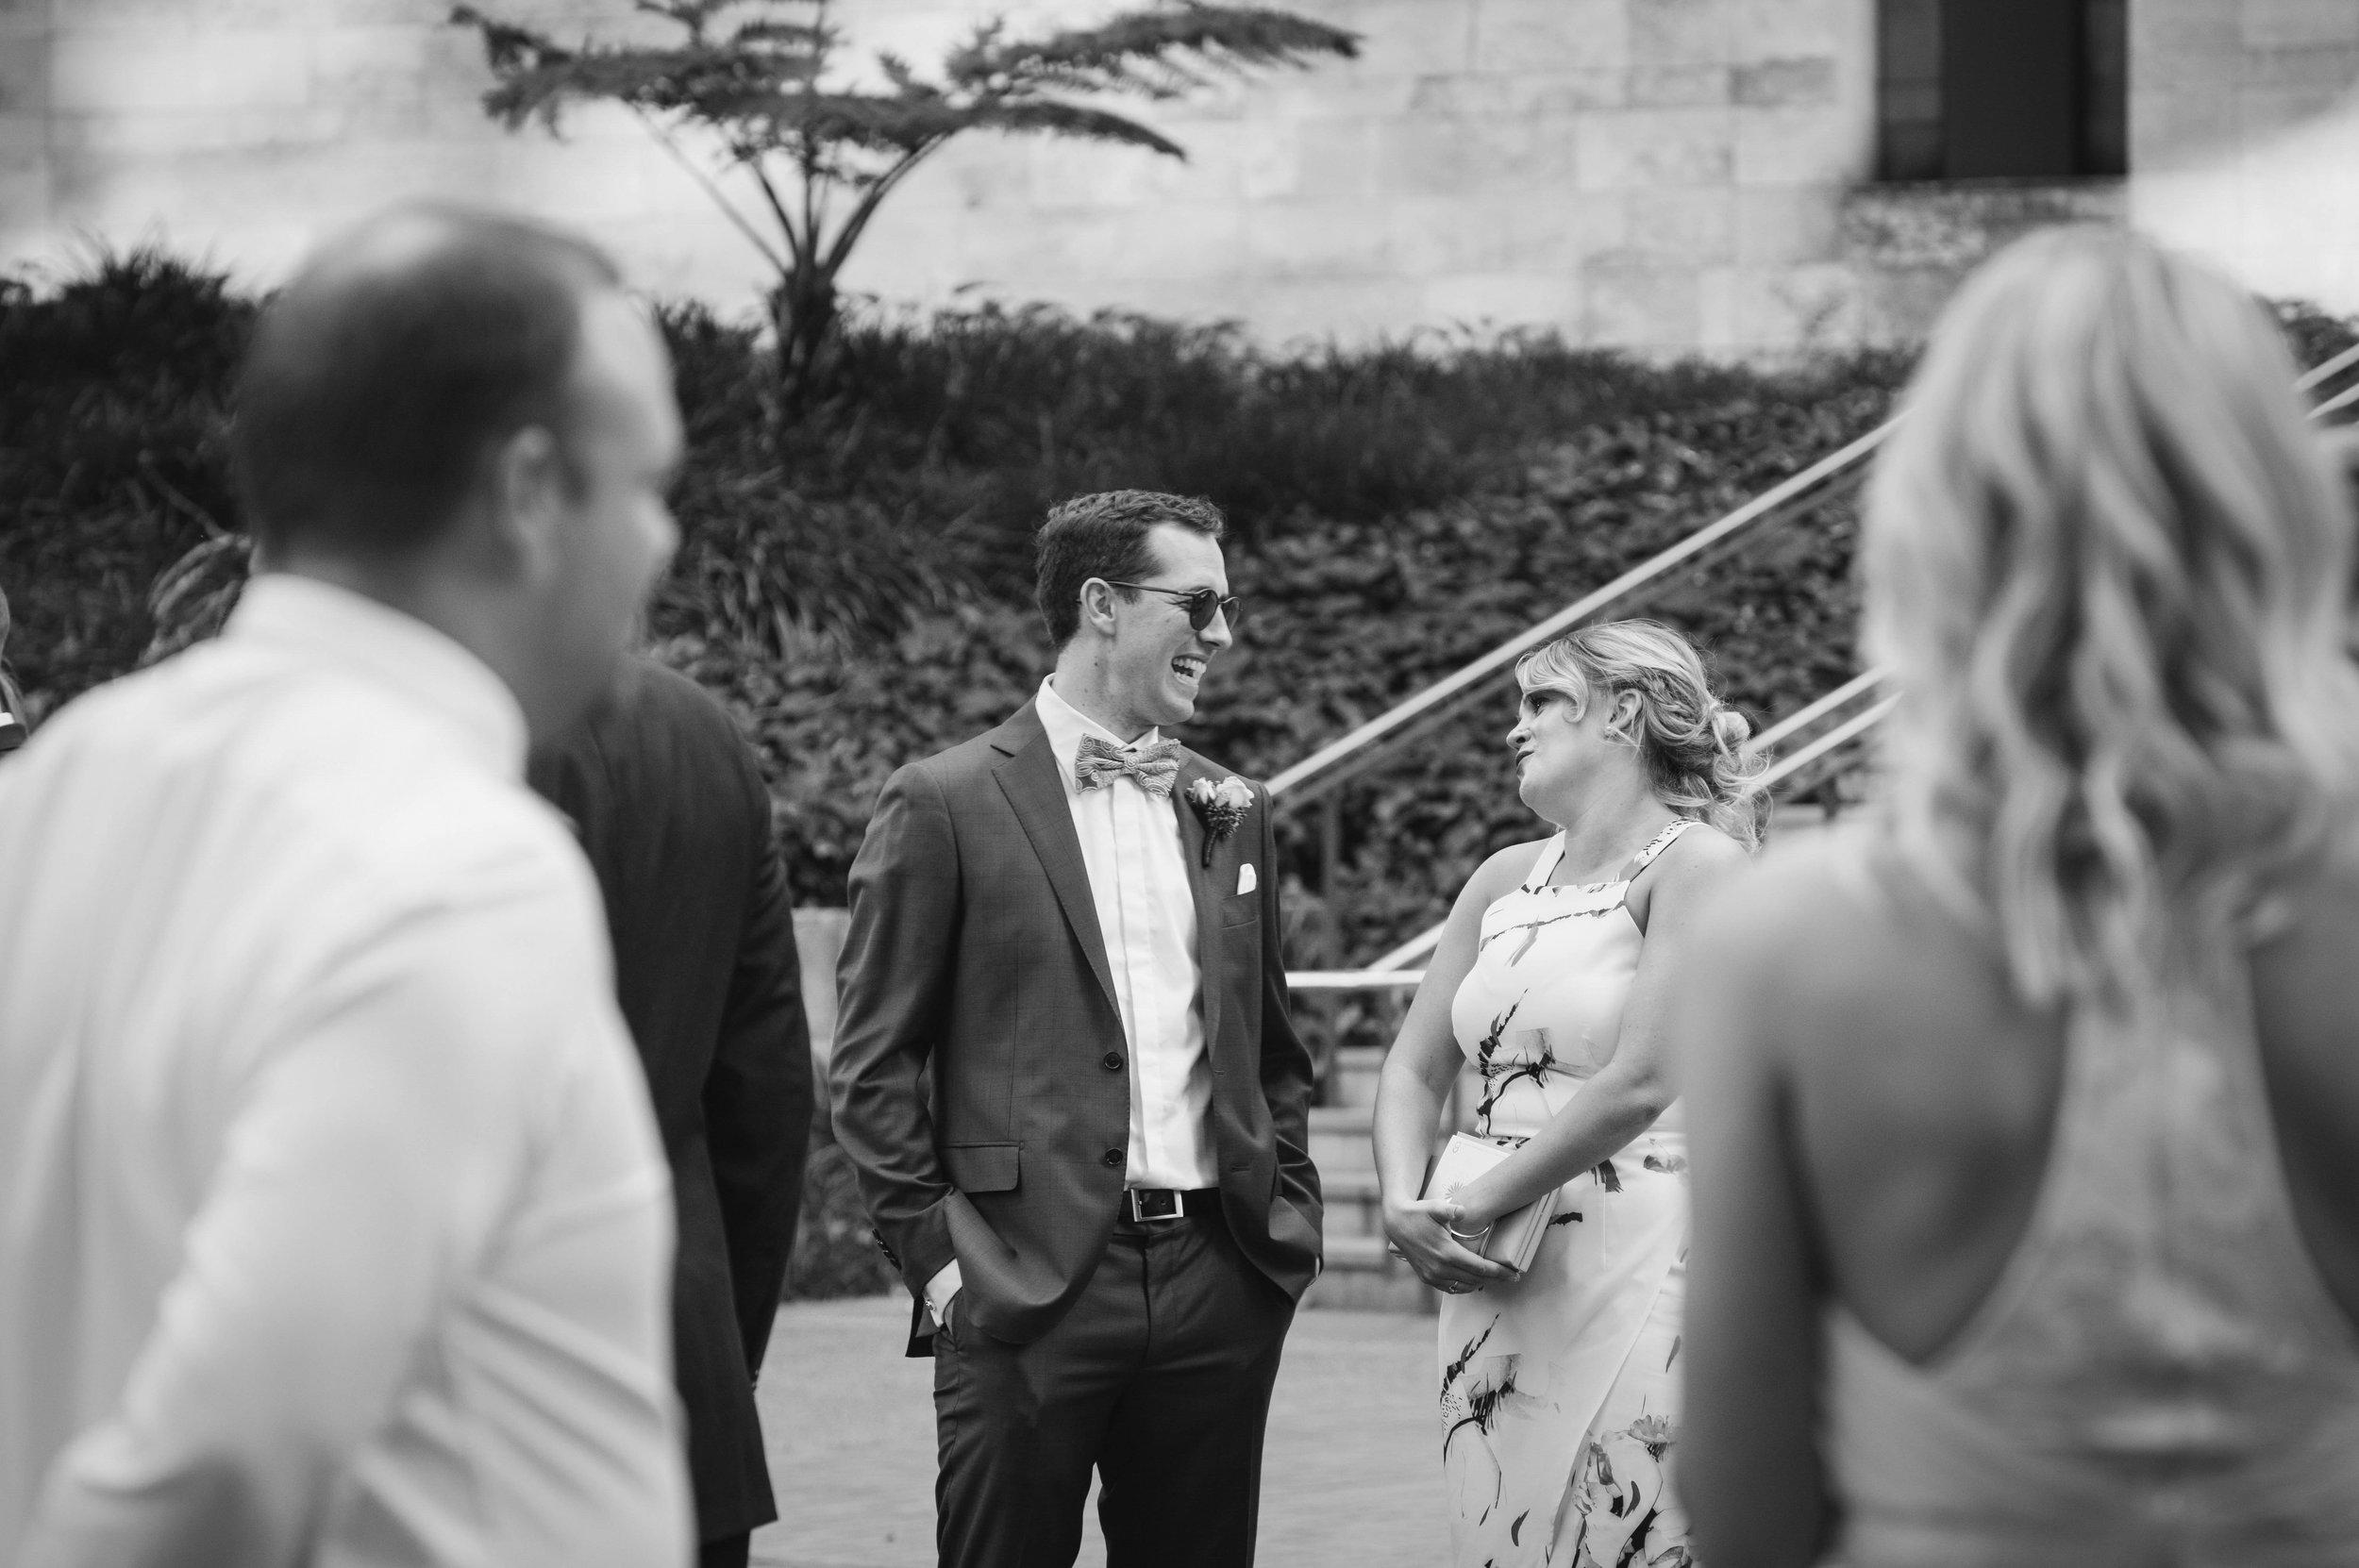 Lamonts Bishops House City Urban Perth Wheatbelt Avon Valley Wedding Photographer Photography (5).jpg